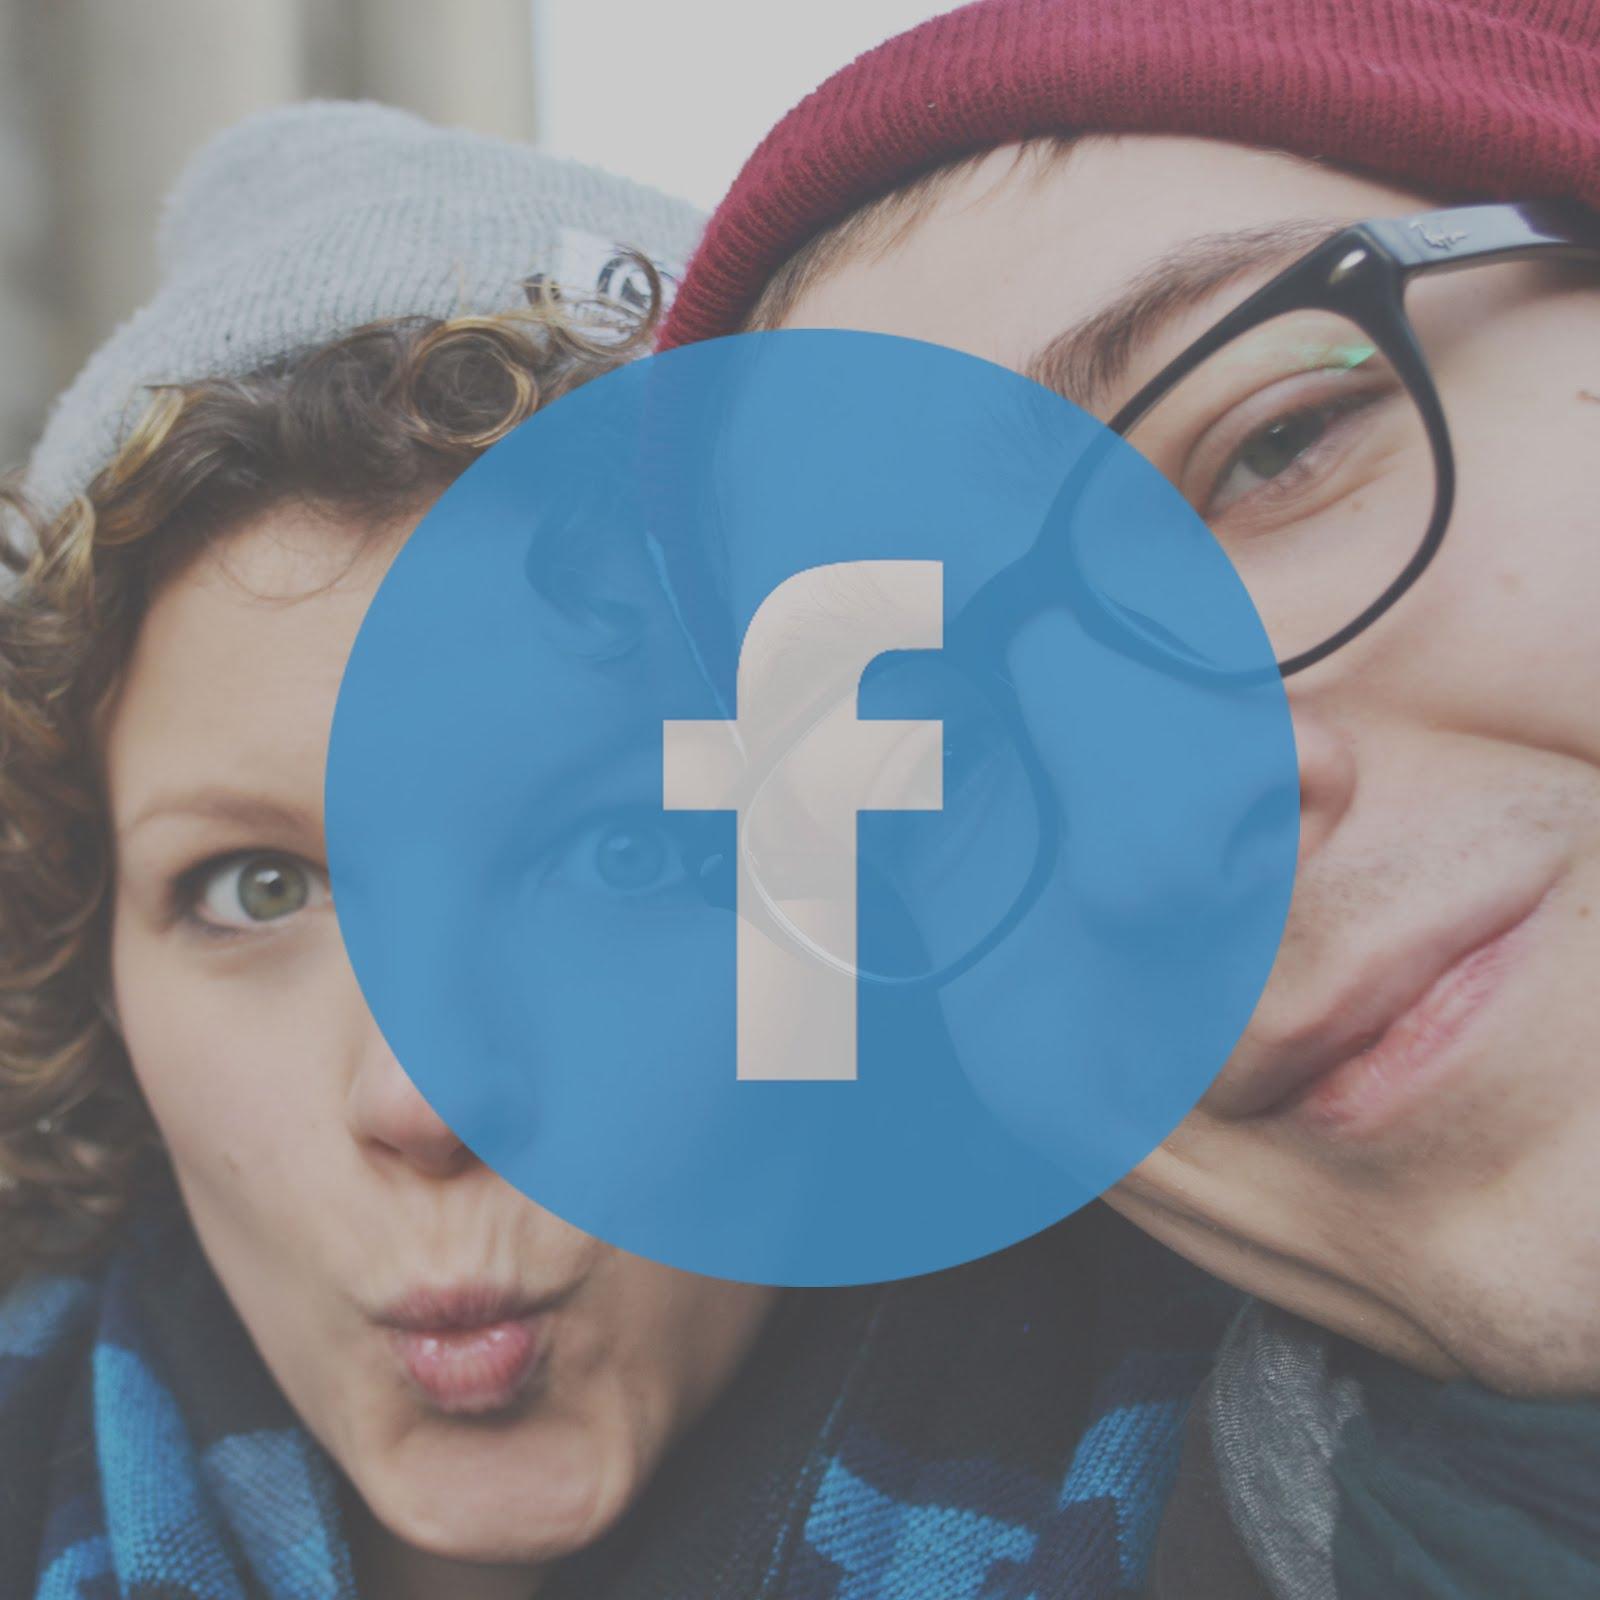 ŚLEDŹ na Facebooku